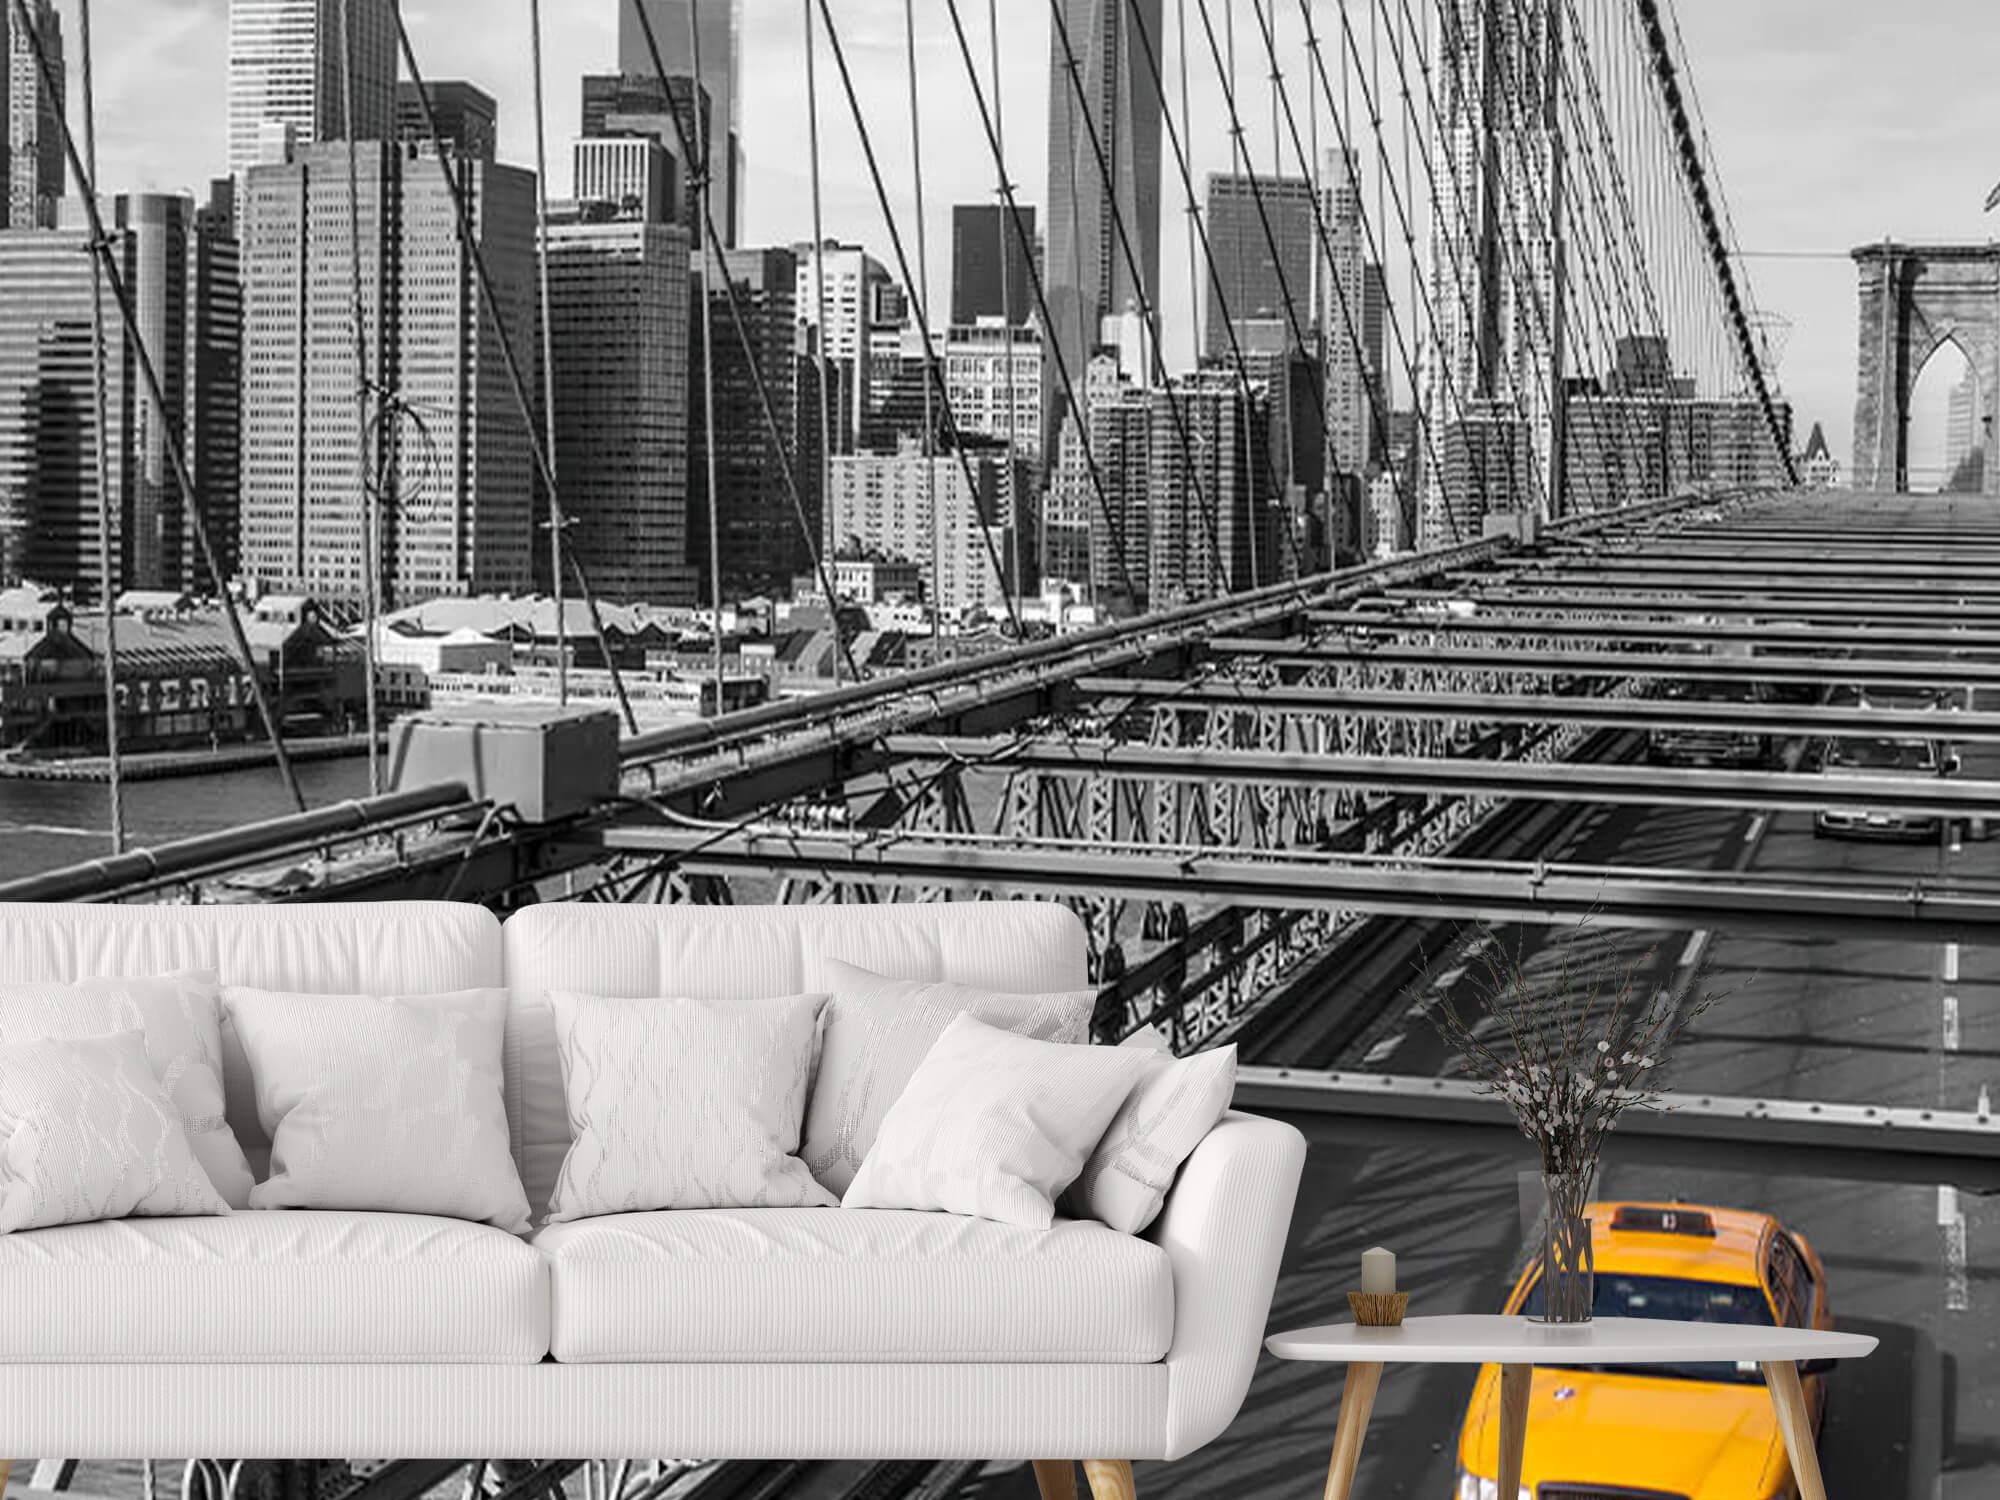 Un taxi sur le pont de Brooklyn 4